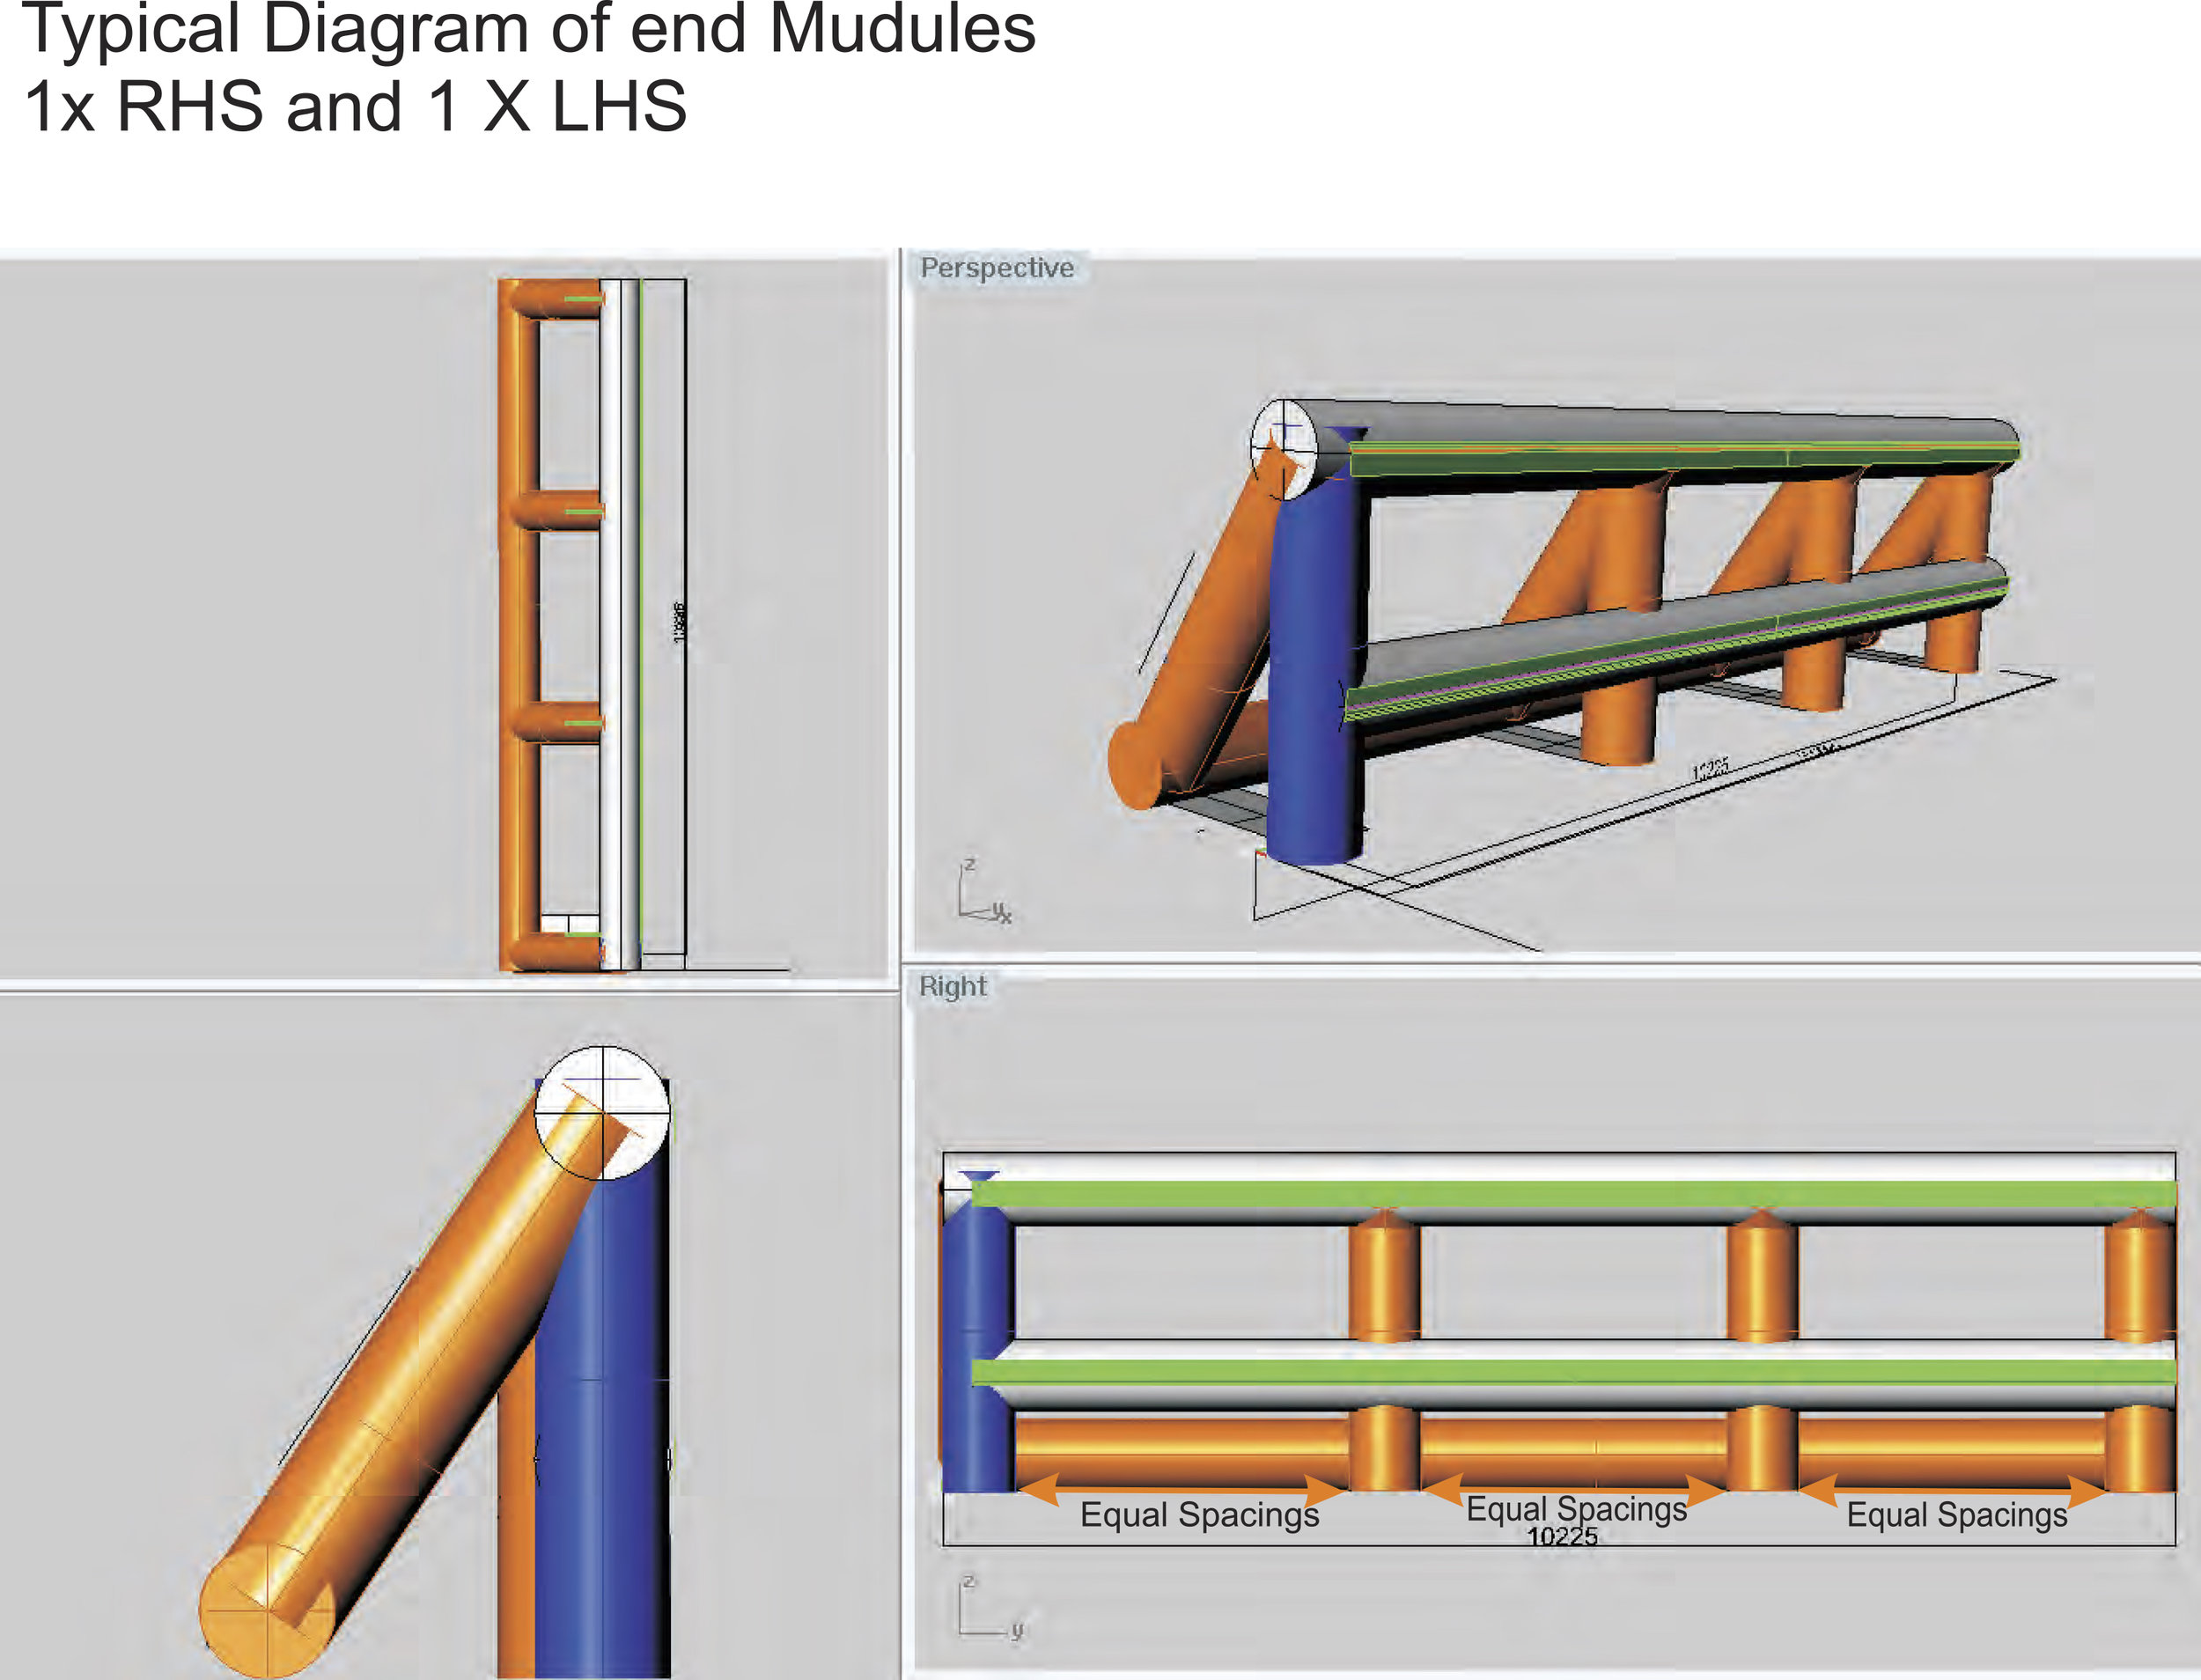 Production detailsLr-9.jpg